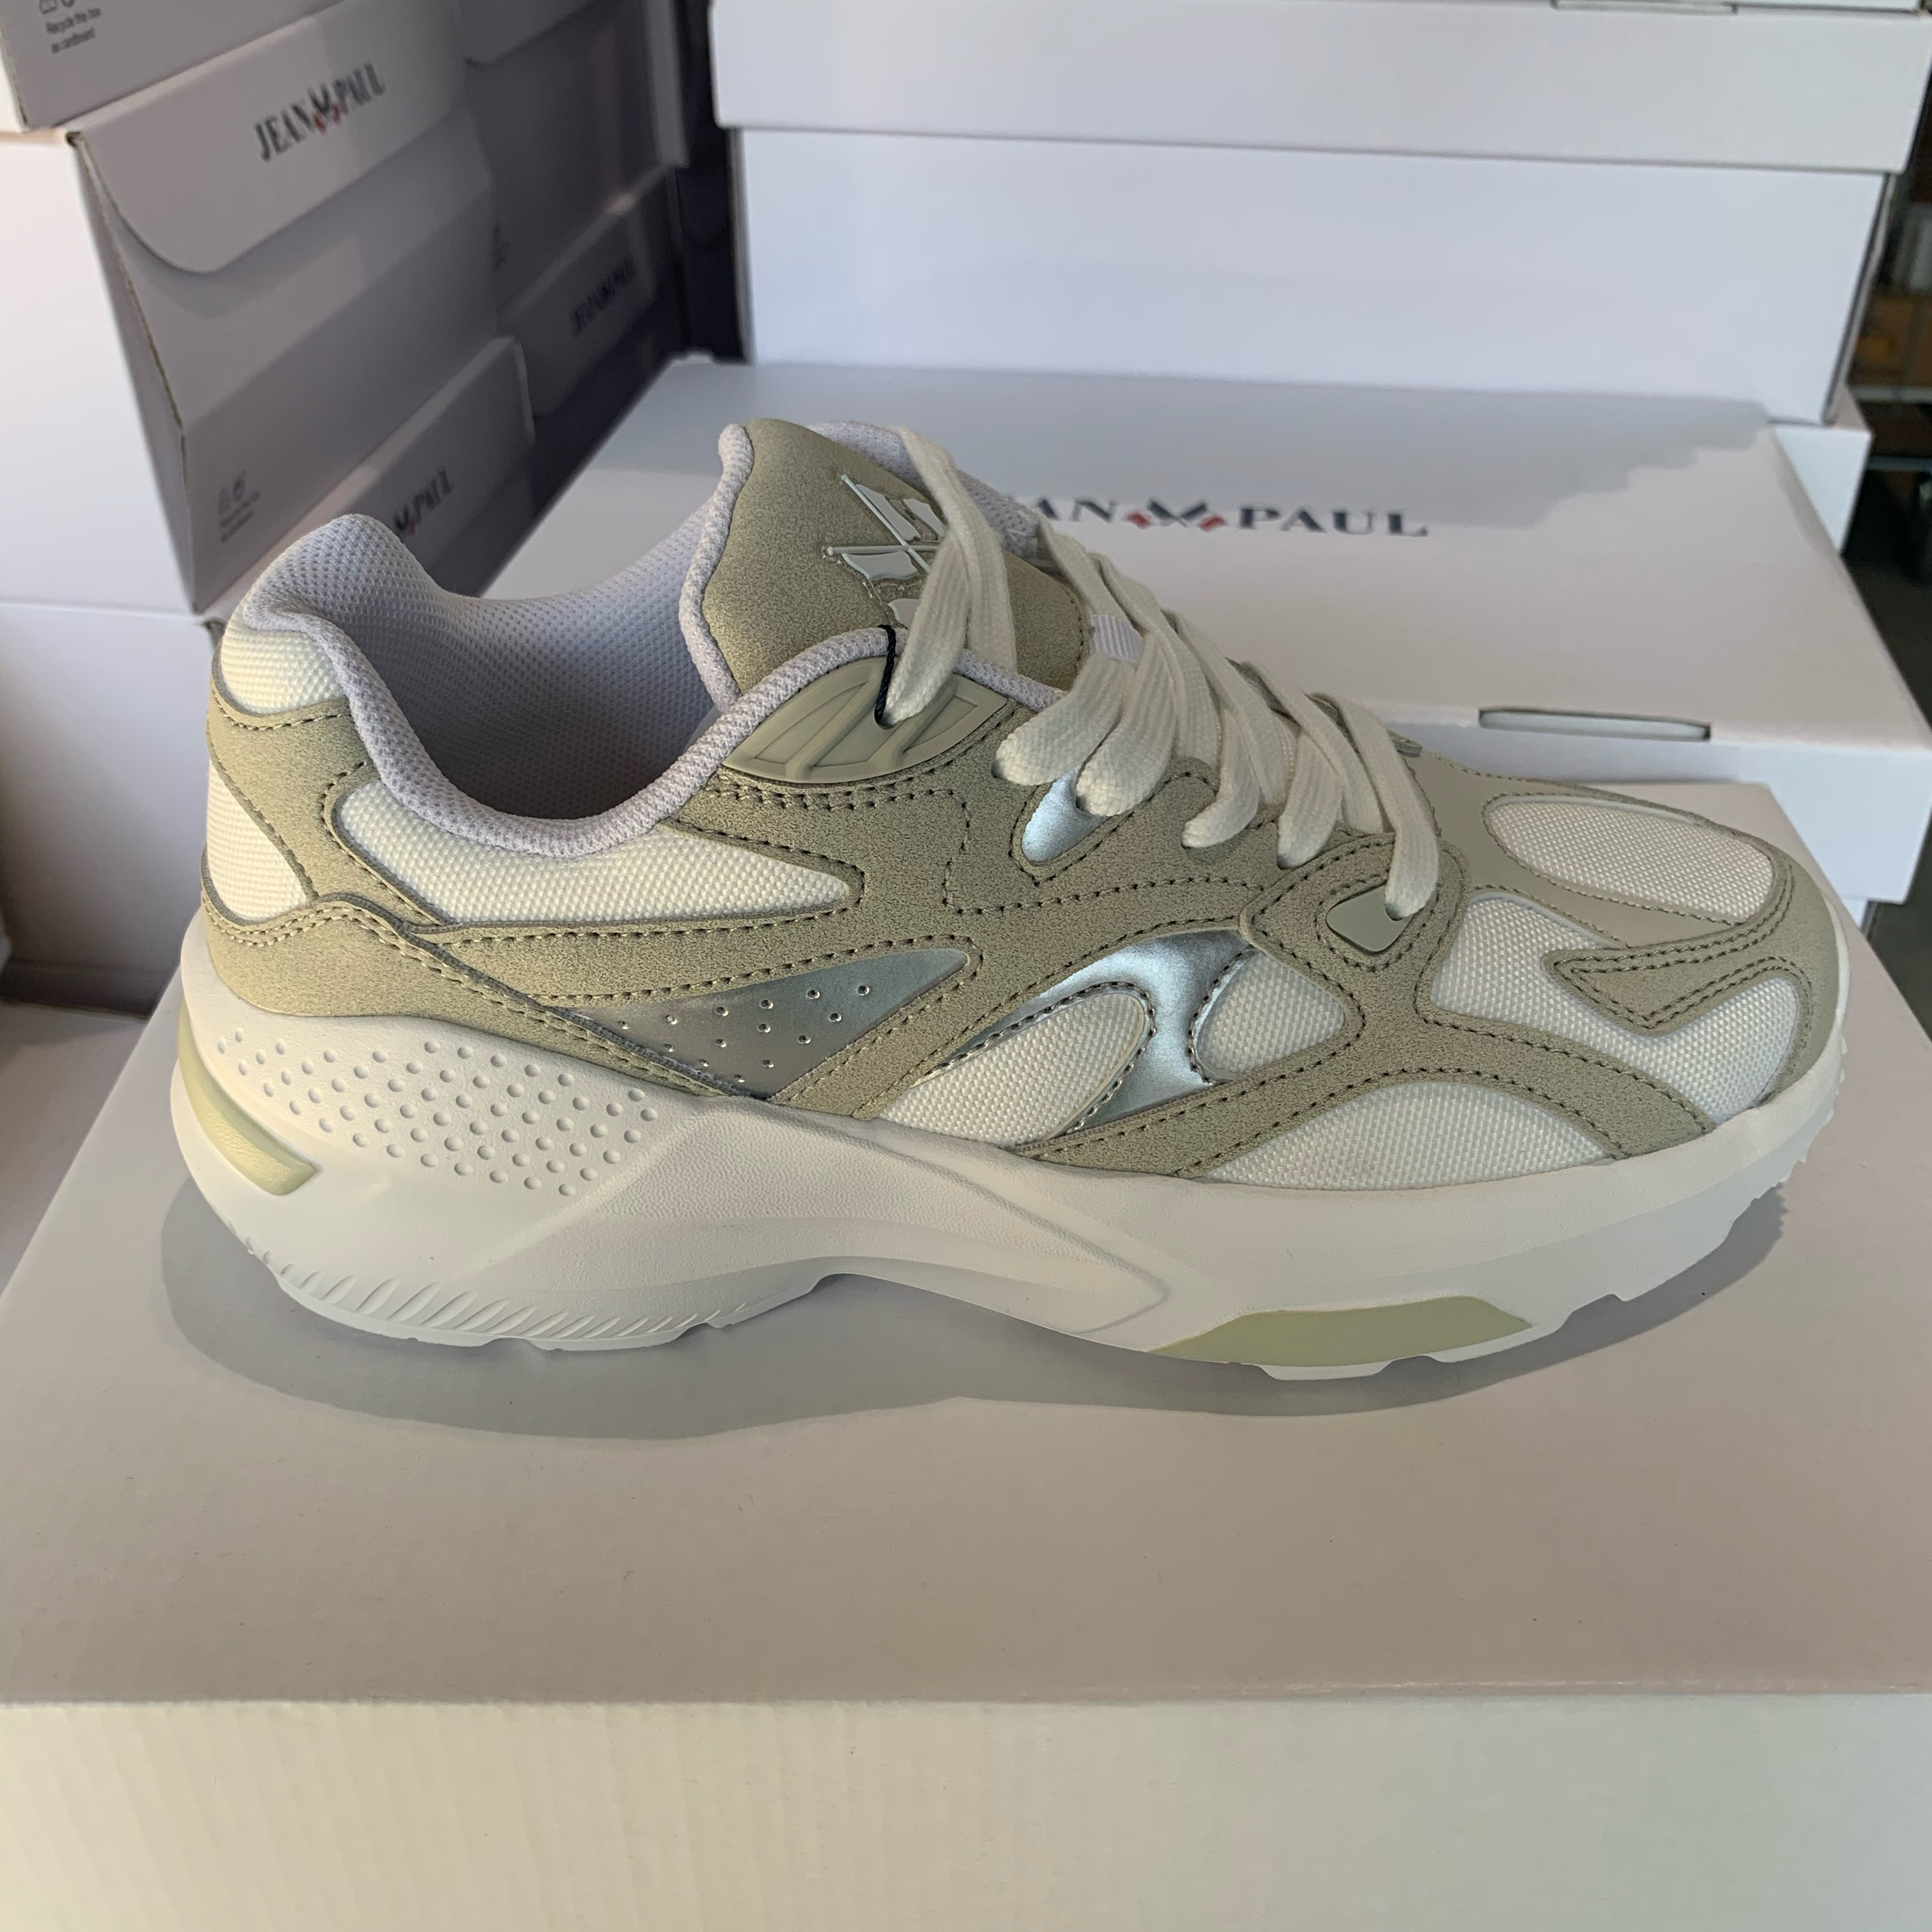 jean paul aix chunky sneakers white beige5